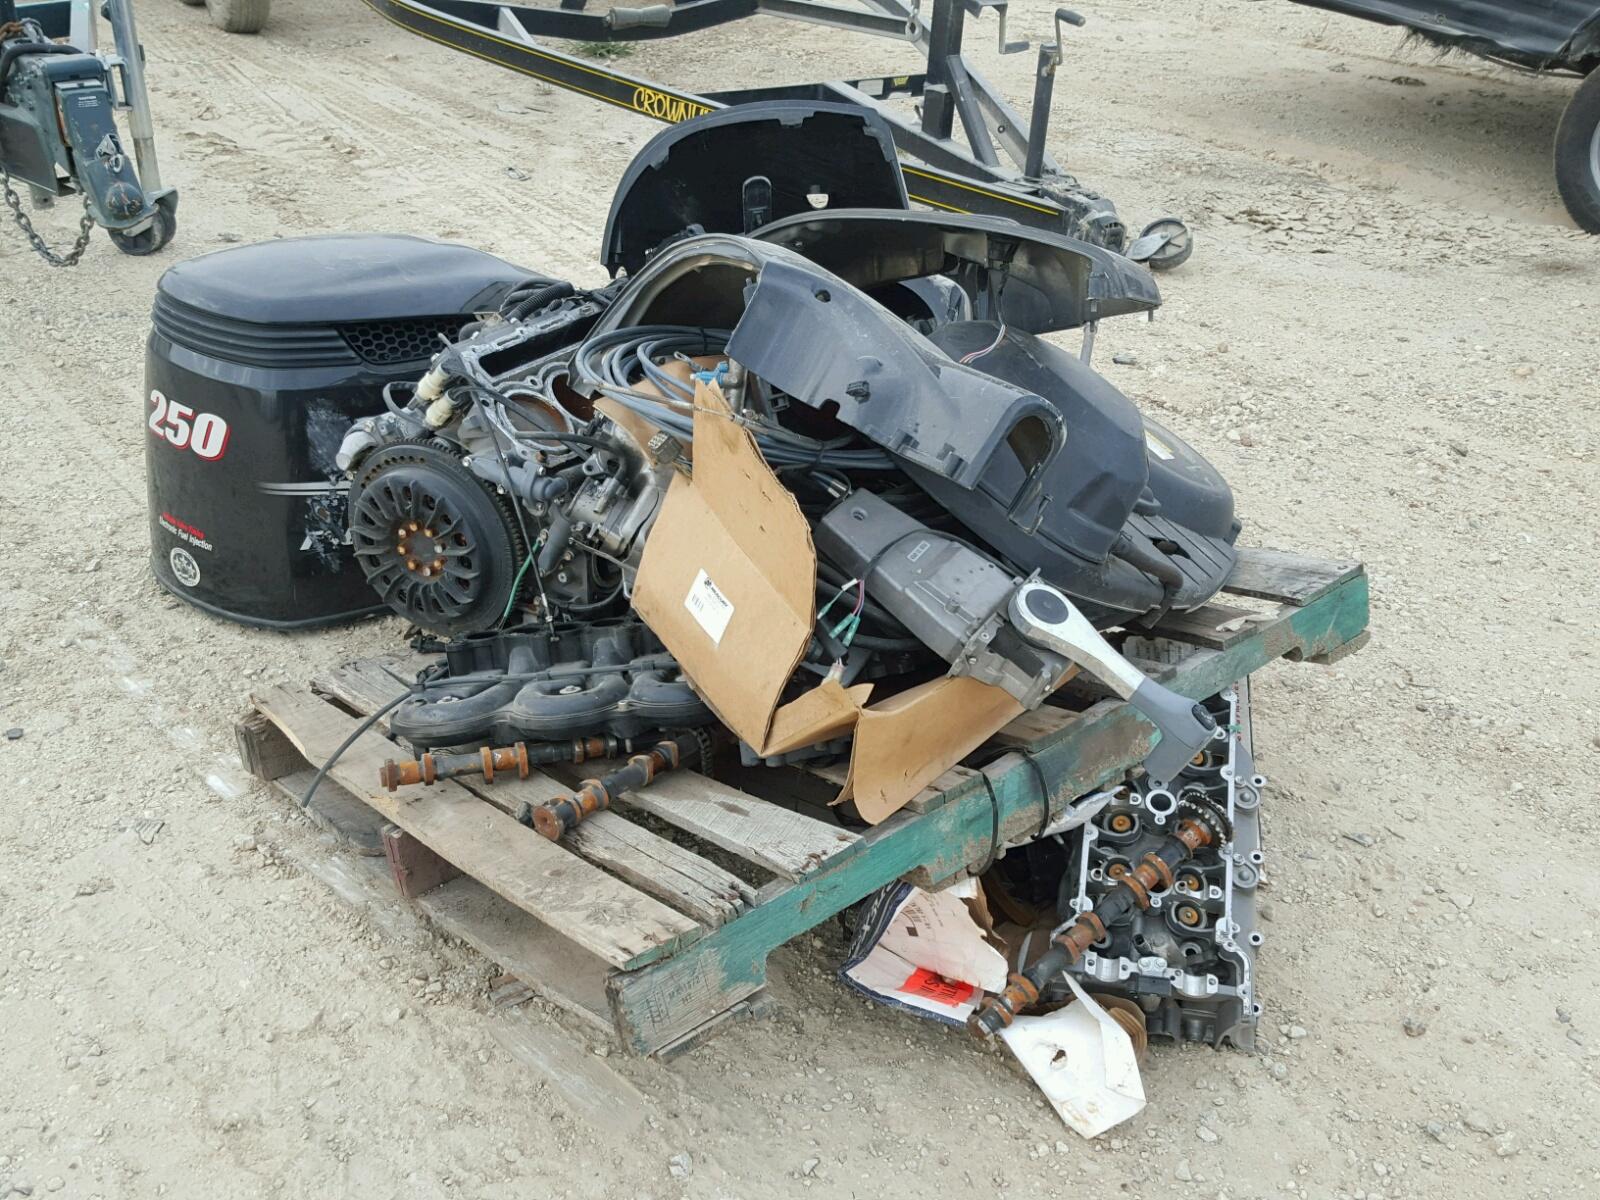 Salvage 2013 Suzuki MARINE LOT for sale